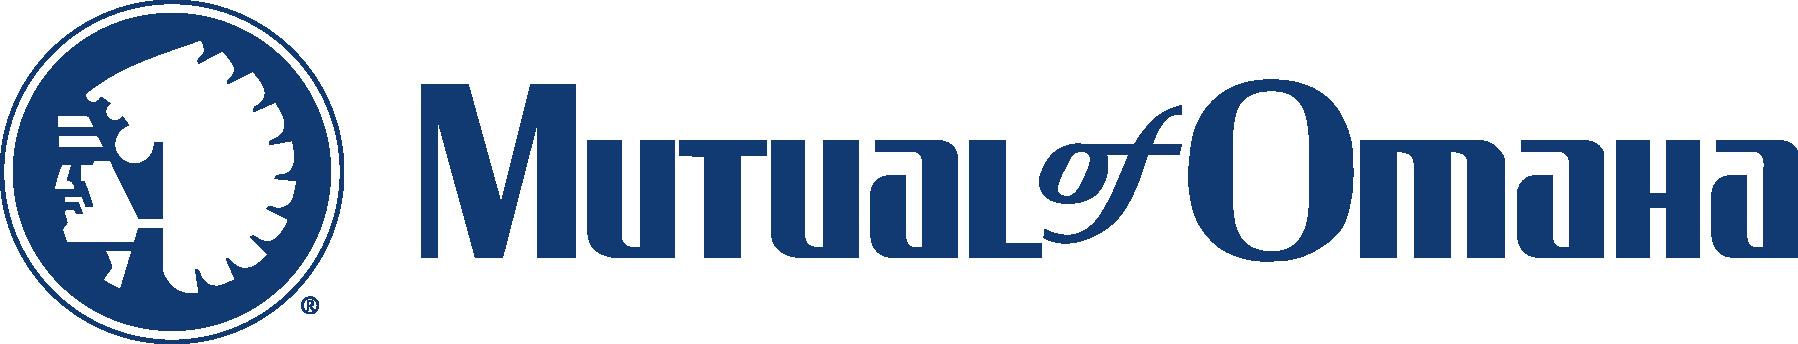 Mutual of Omaha 2019.png